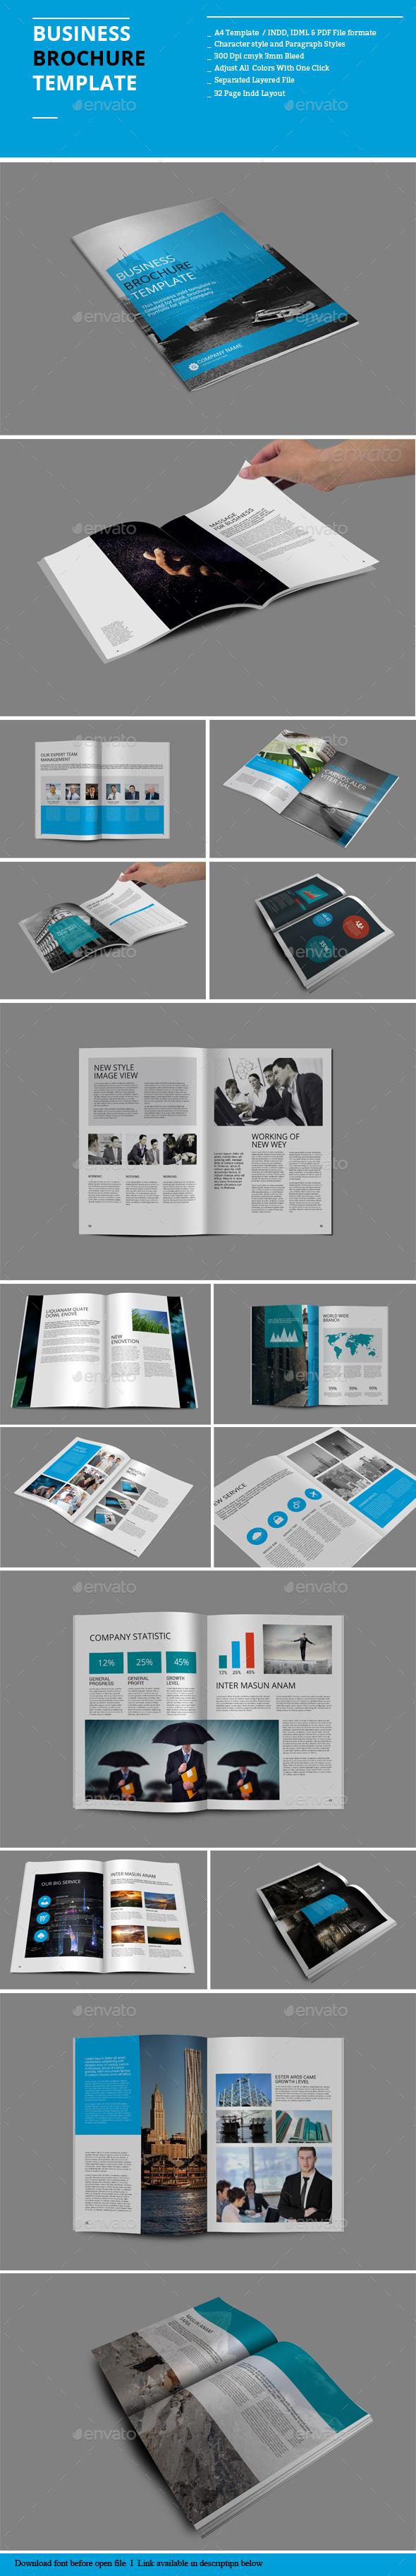 GraphicRiver Business Brochure Templates 8890024